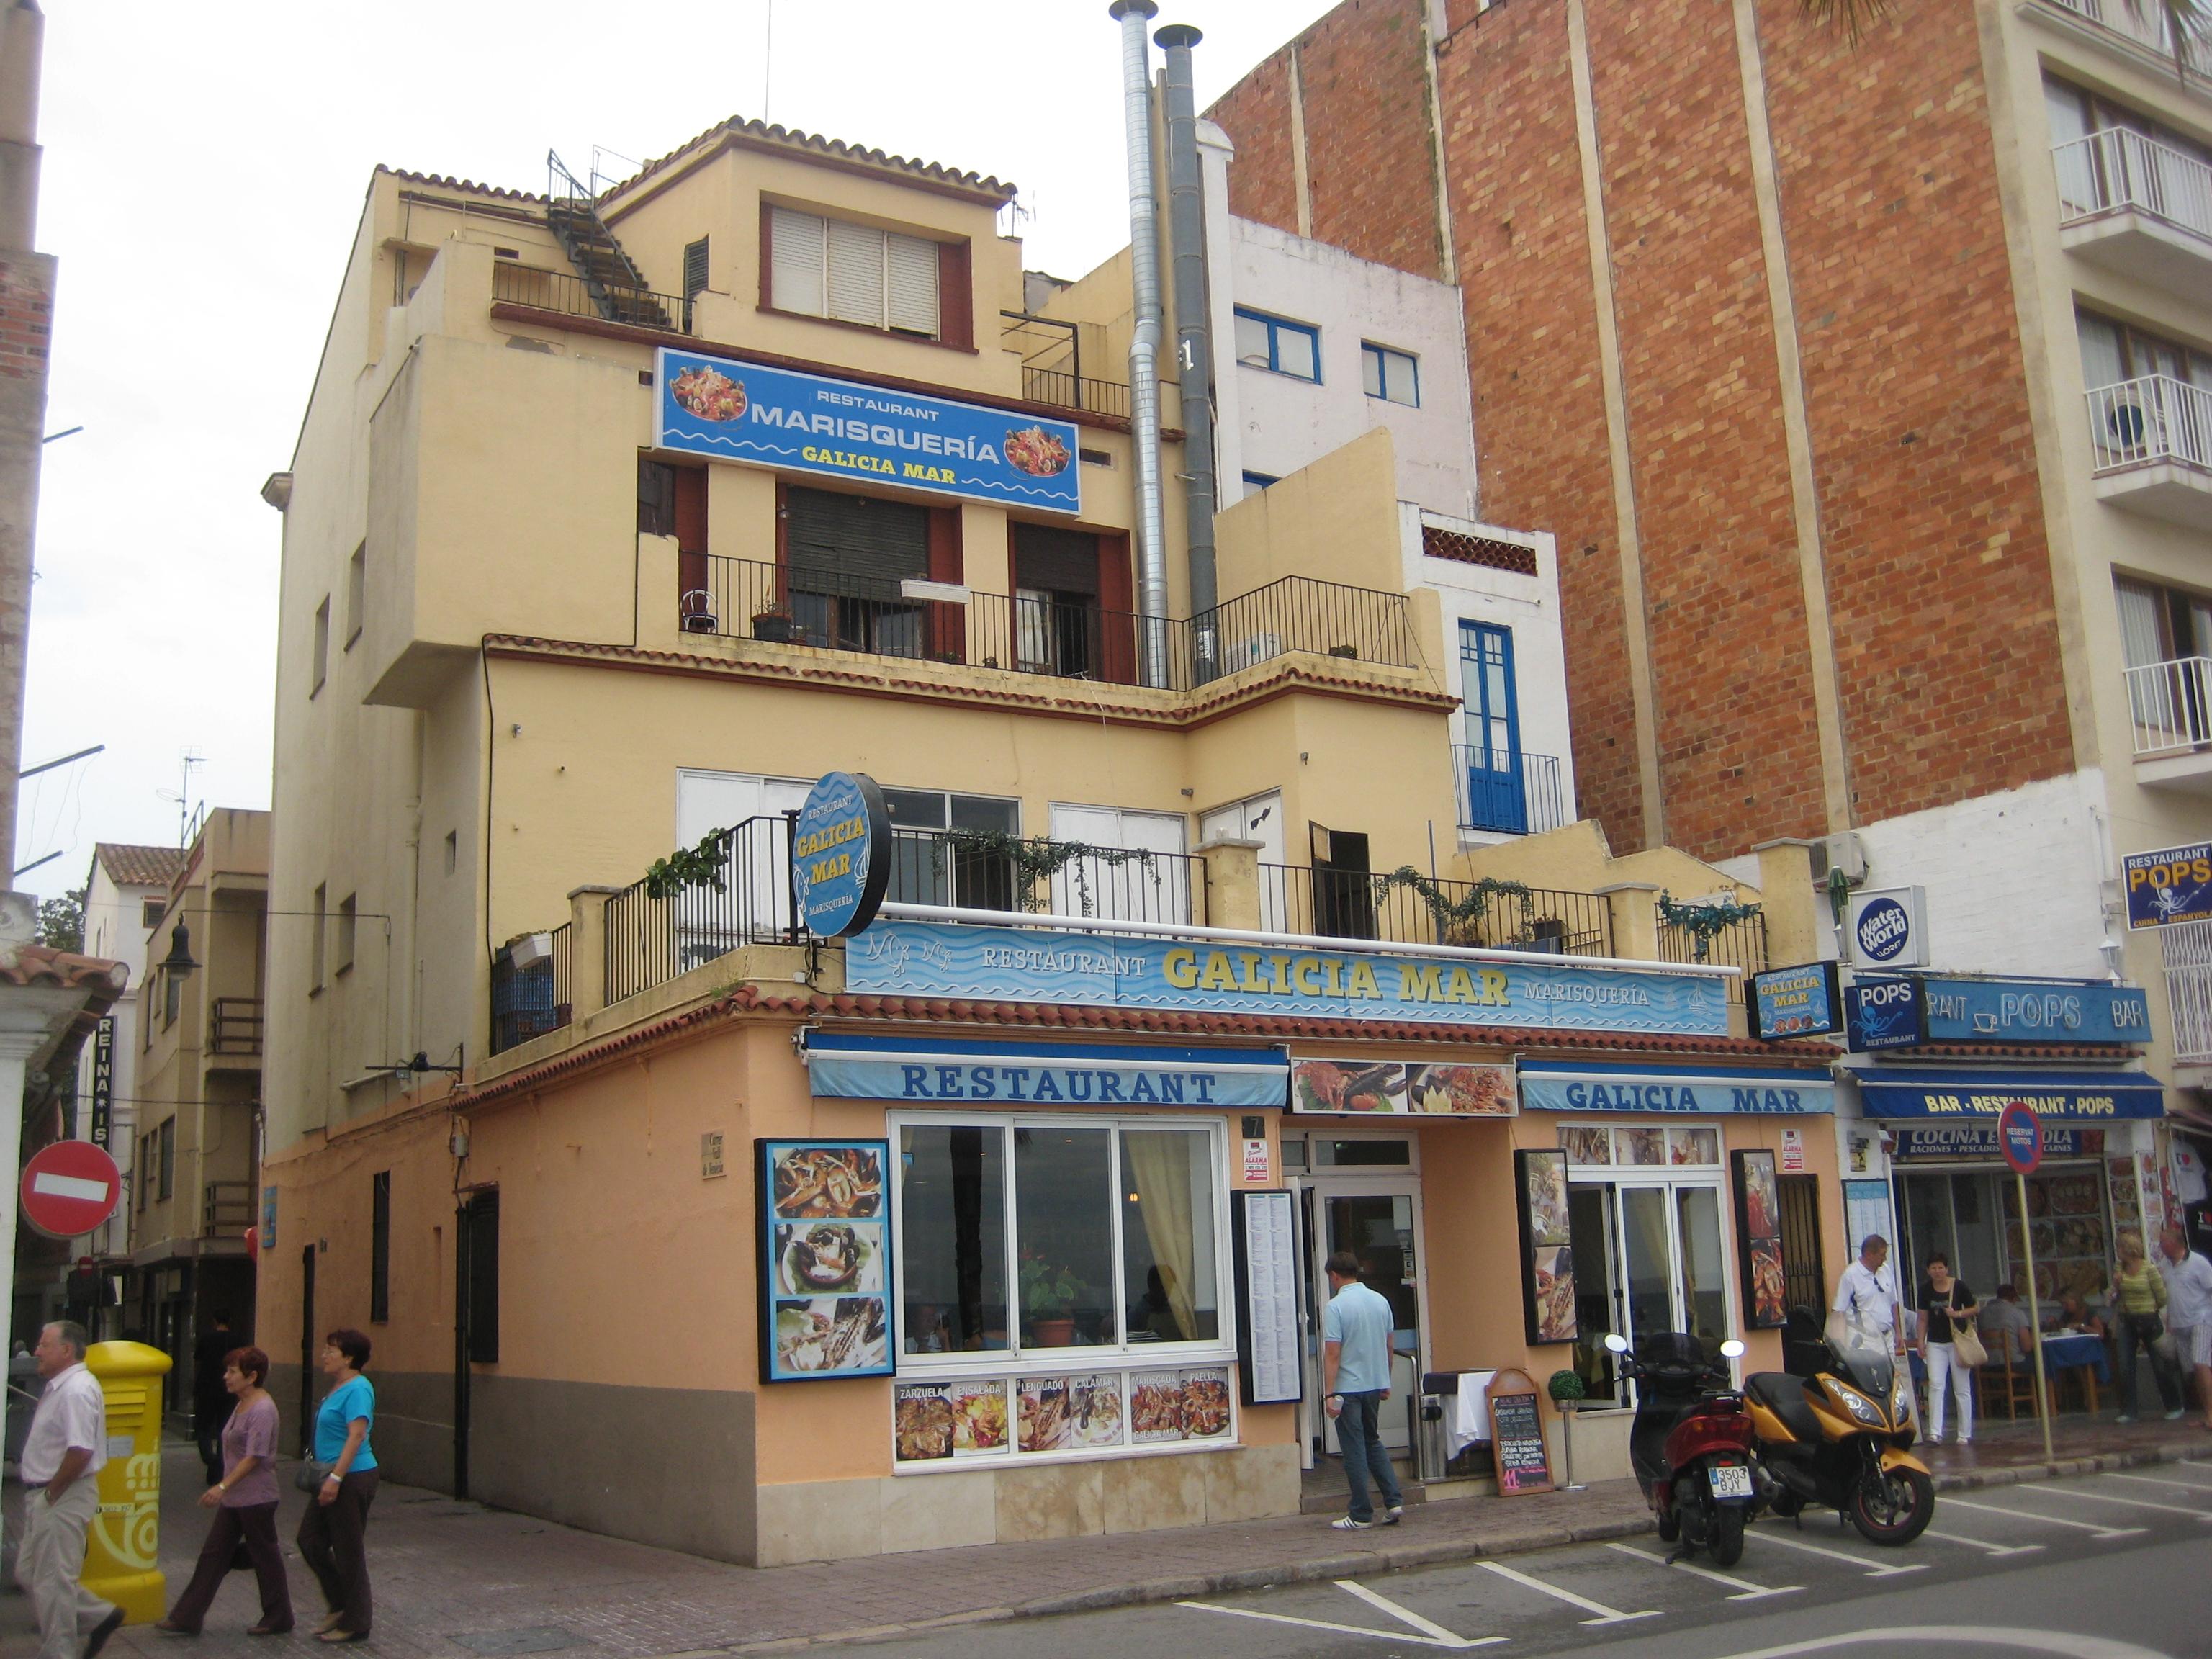 file fish restaurant on quay lloret de mar spain jpg wikimedia commons. Black Bedroom Furniture Sets. Home Design Ideas